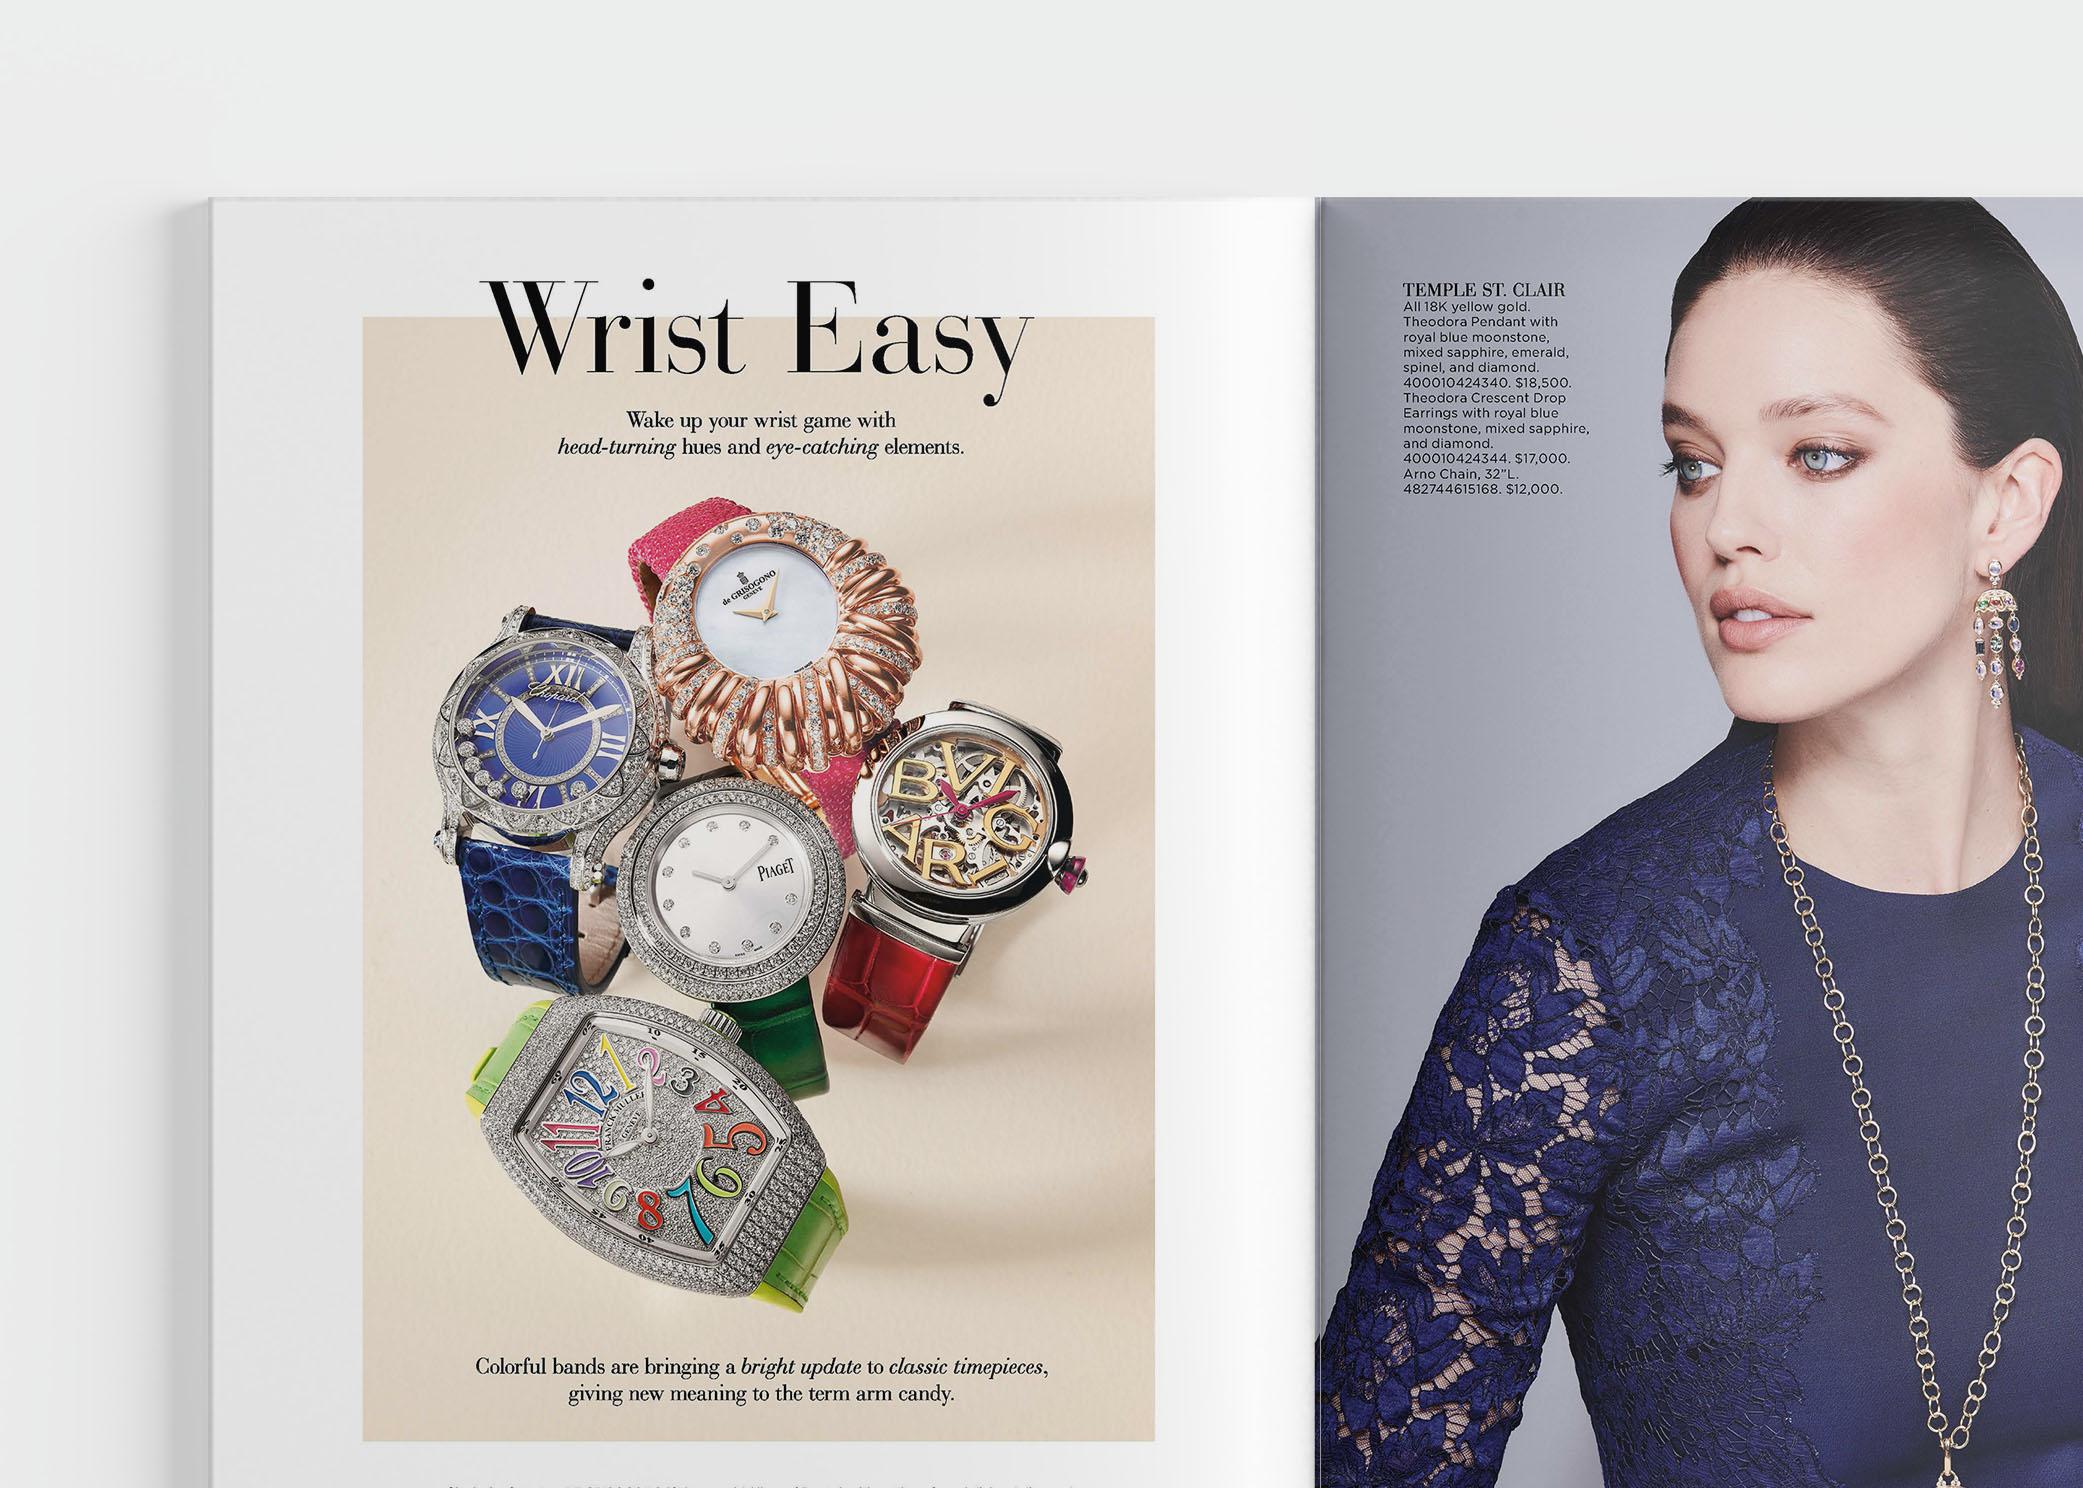 Fifth Avenue Catalog >> Saks Fifth Avenue Jewelry Campaign 2019 The Studio Of